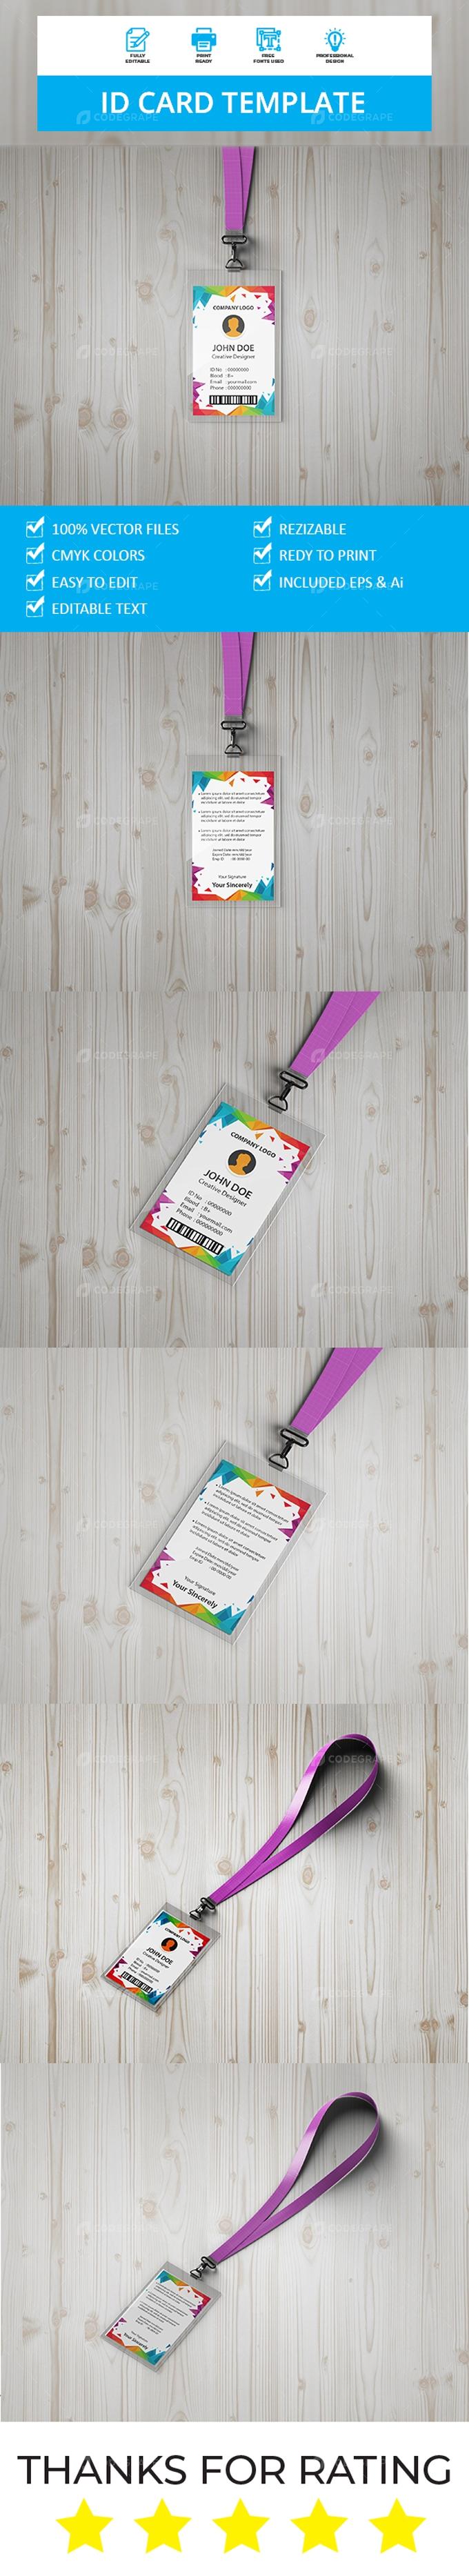 ID Card Template